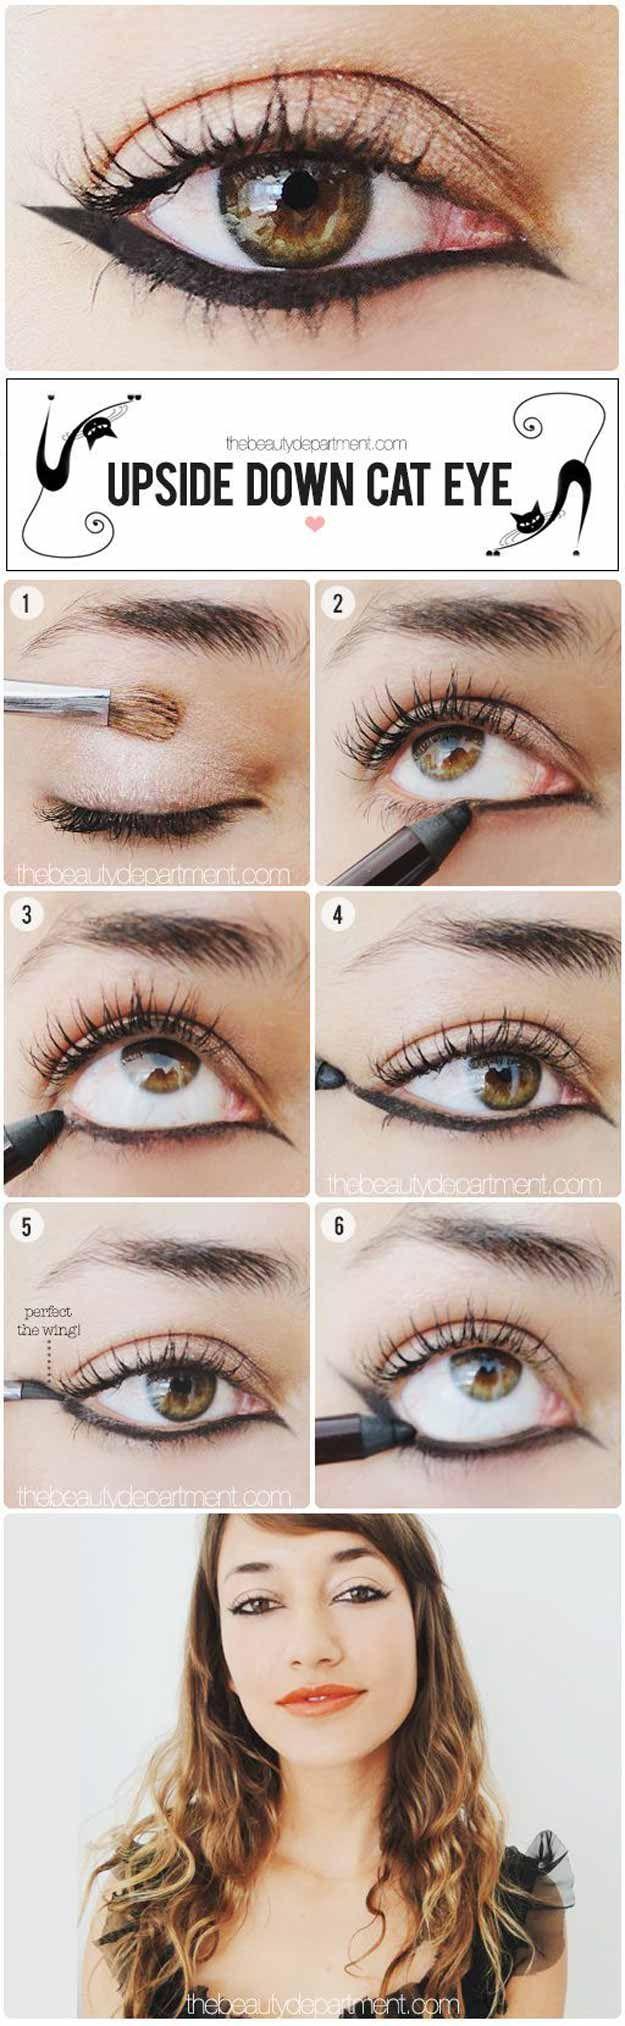 17 Great Eyeliner Hacks - From Makeup Tutorials :: @TutorialsMakeup :: | Glamour Shots Photography